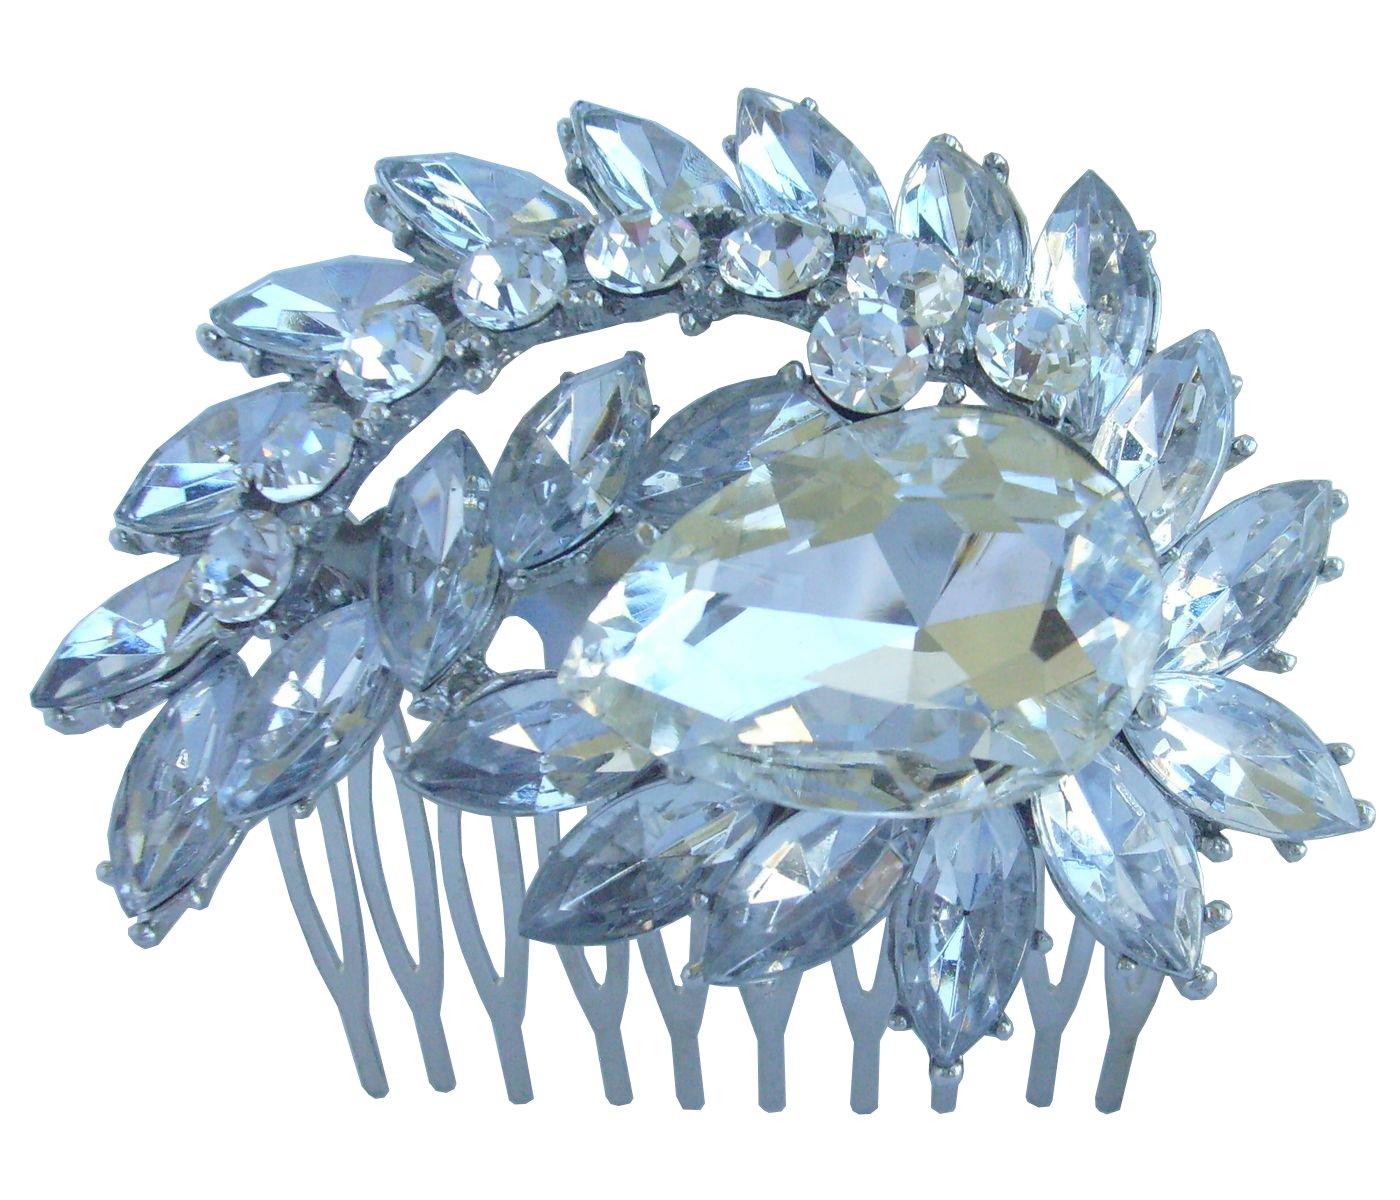 Sindary 2.76'' Teardrop Bridal Hair Comb Clear Rhinestone Crystal Silver Tone Wedding Headpiece HZ4993 by Wedding Hair Accessories-Sindary Jewelry